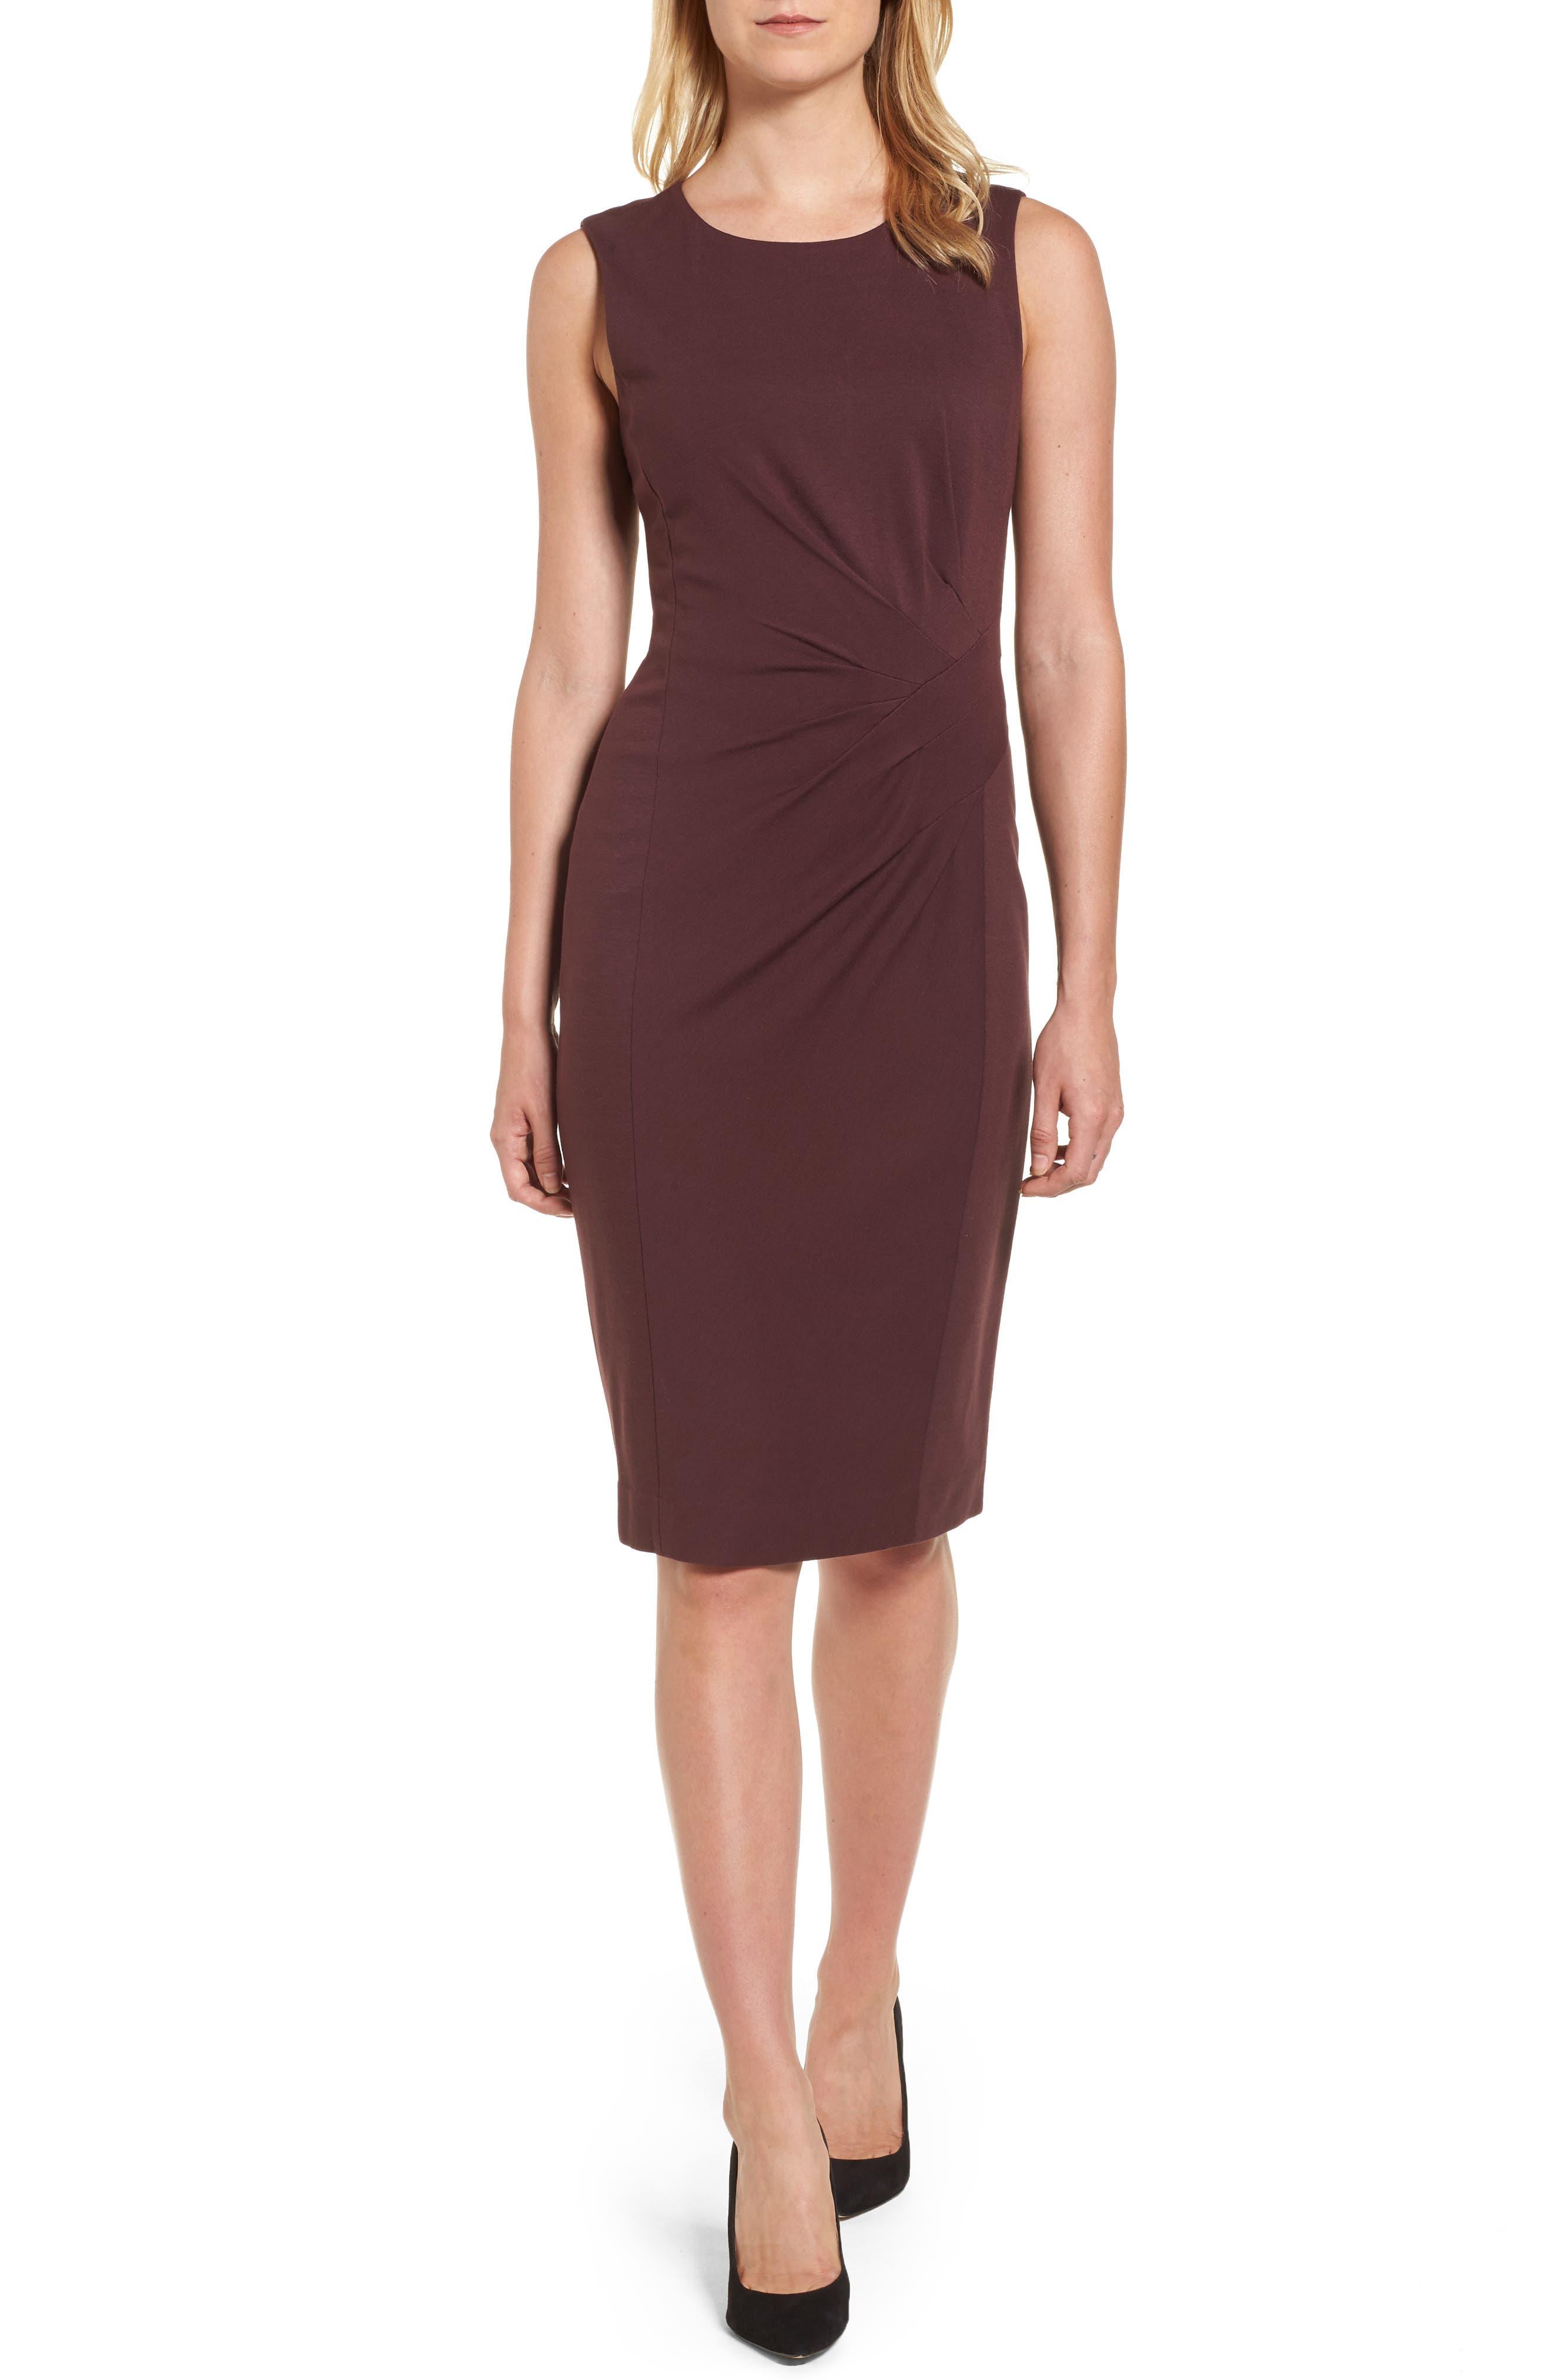 Emerson Rose Pleated Ponte Dress